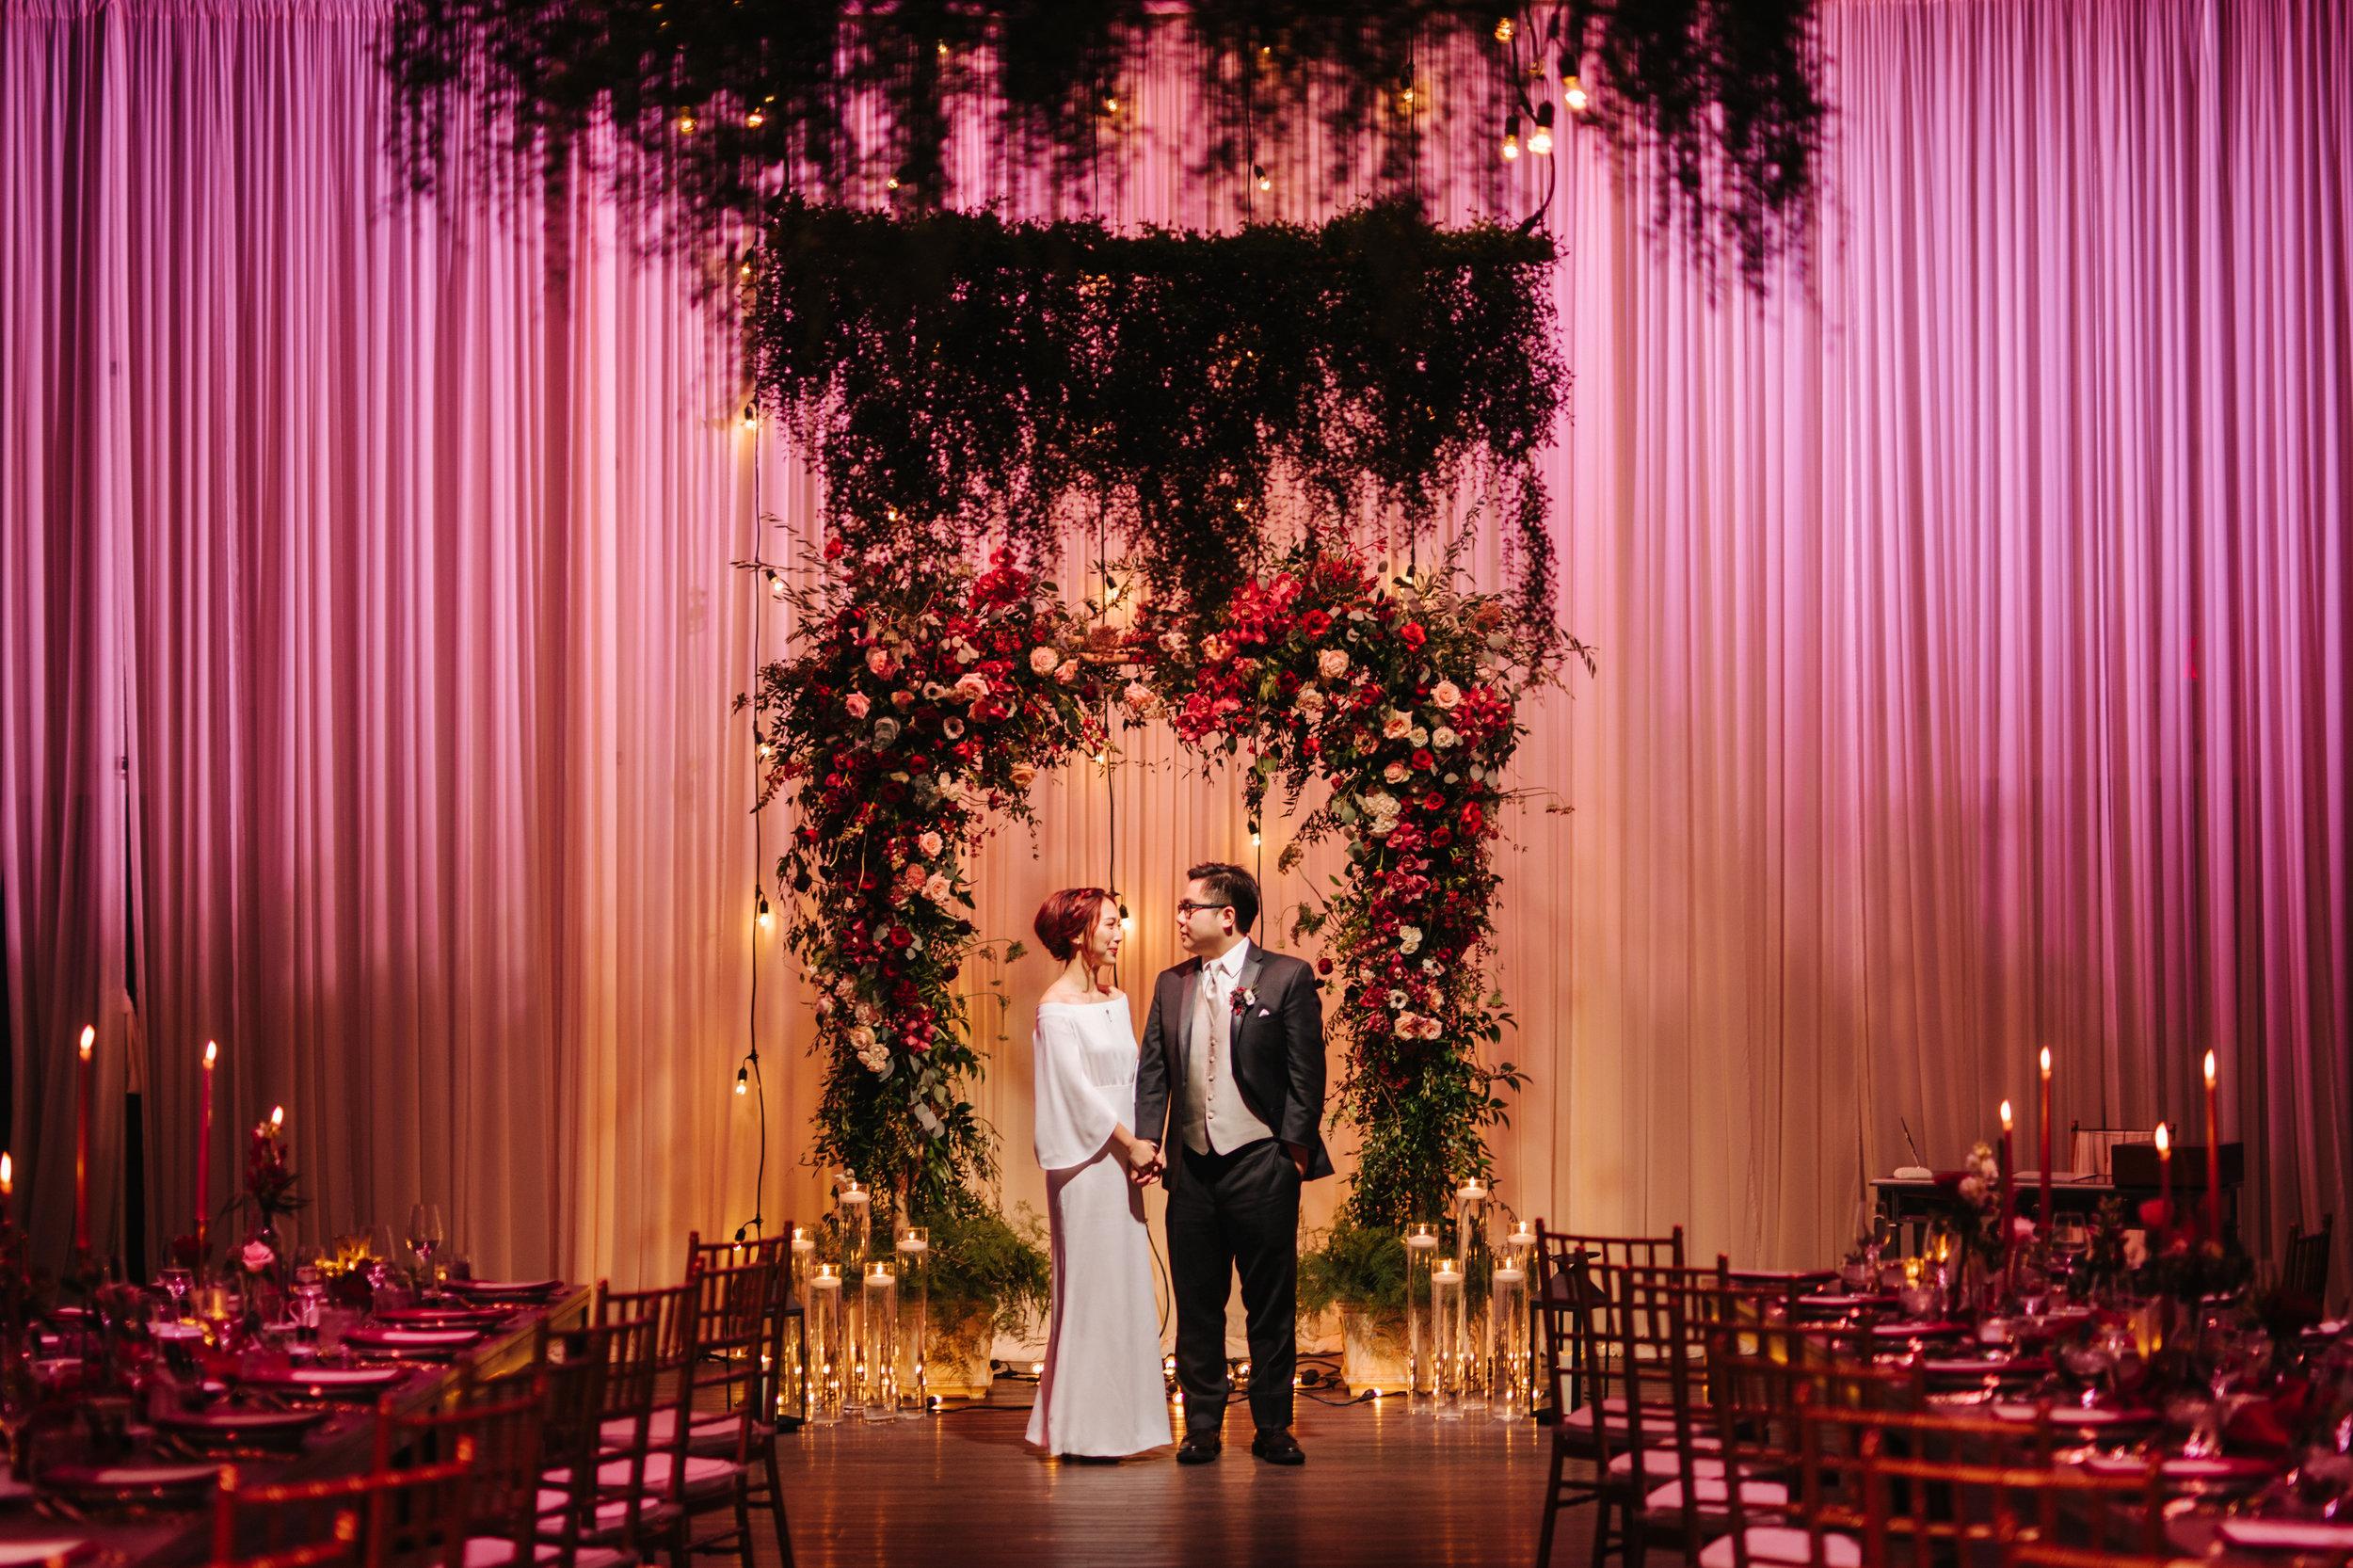 herastudios_event_bride_groom_hera_selects-6.jpg